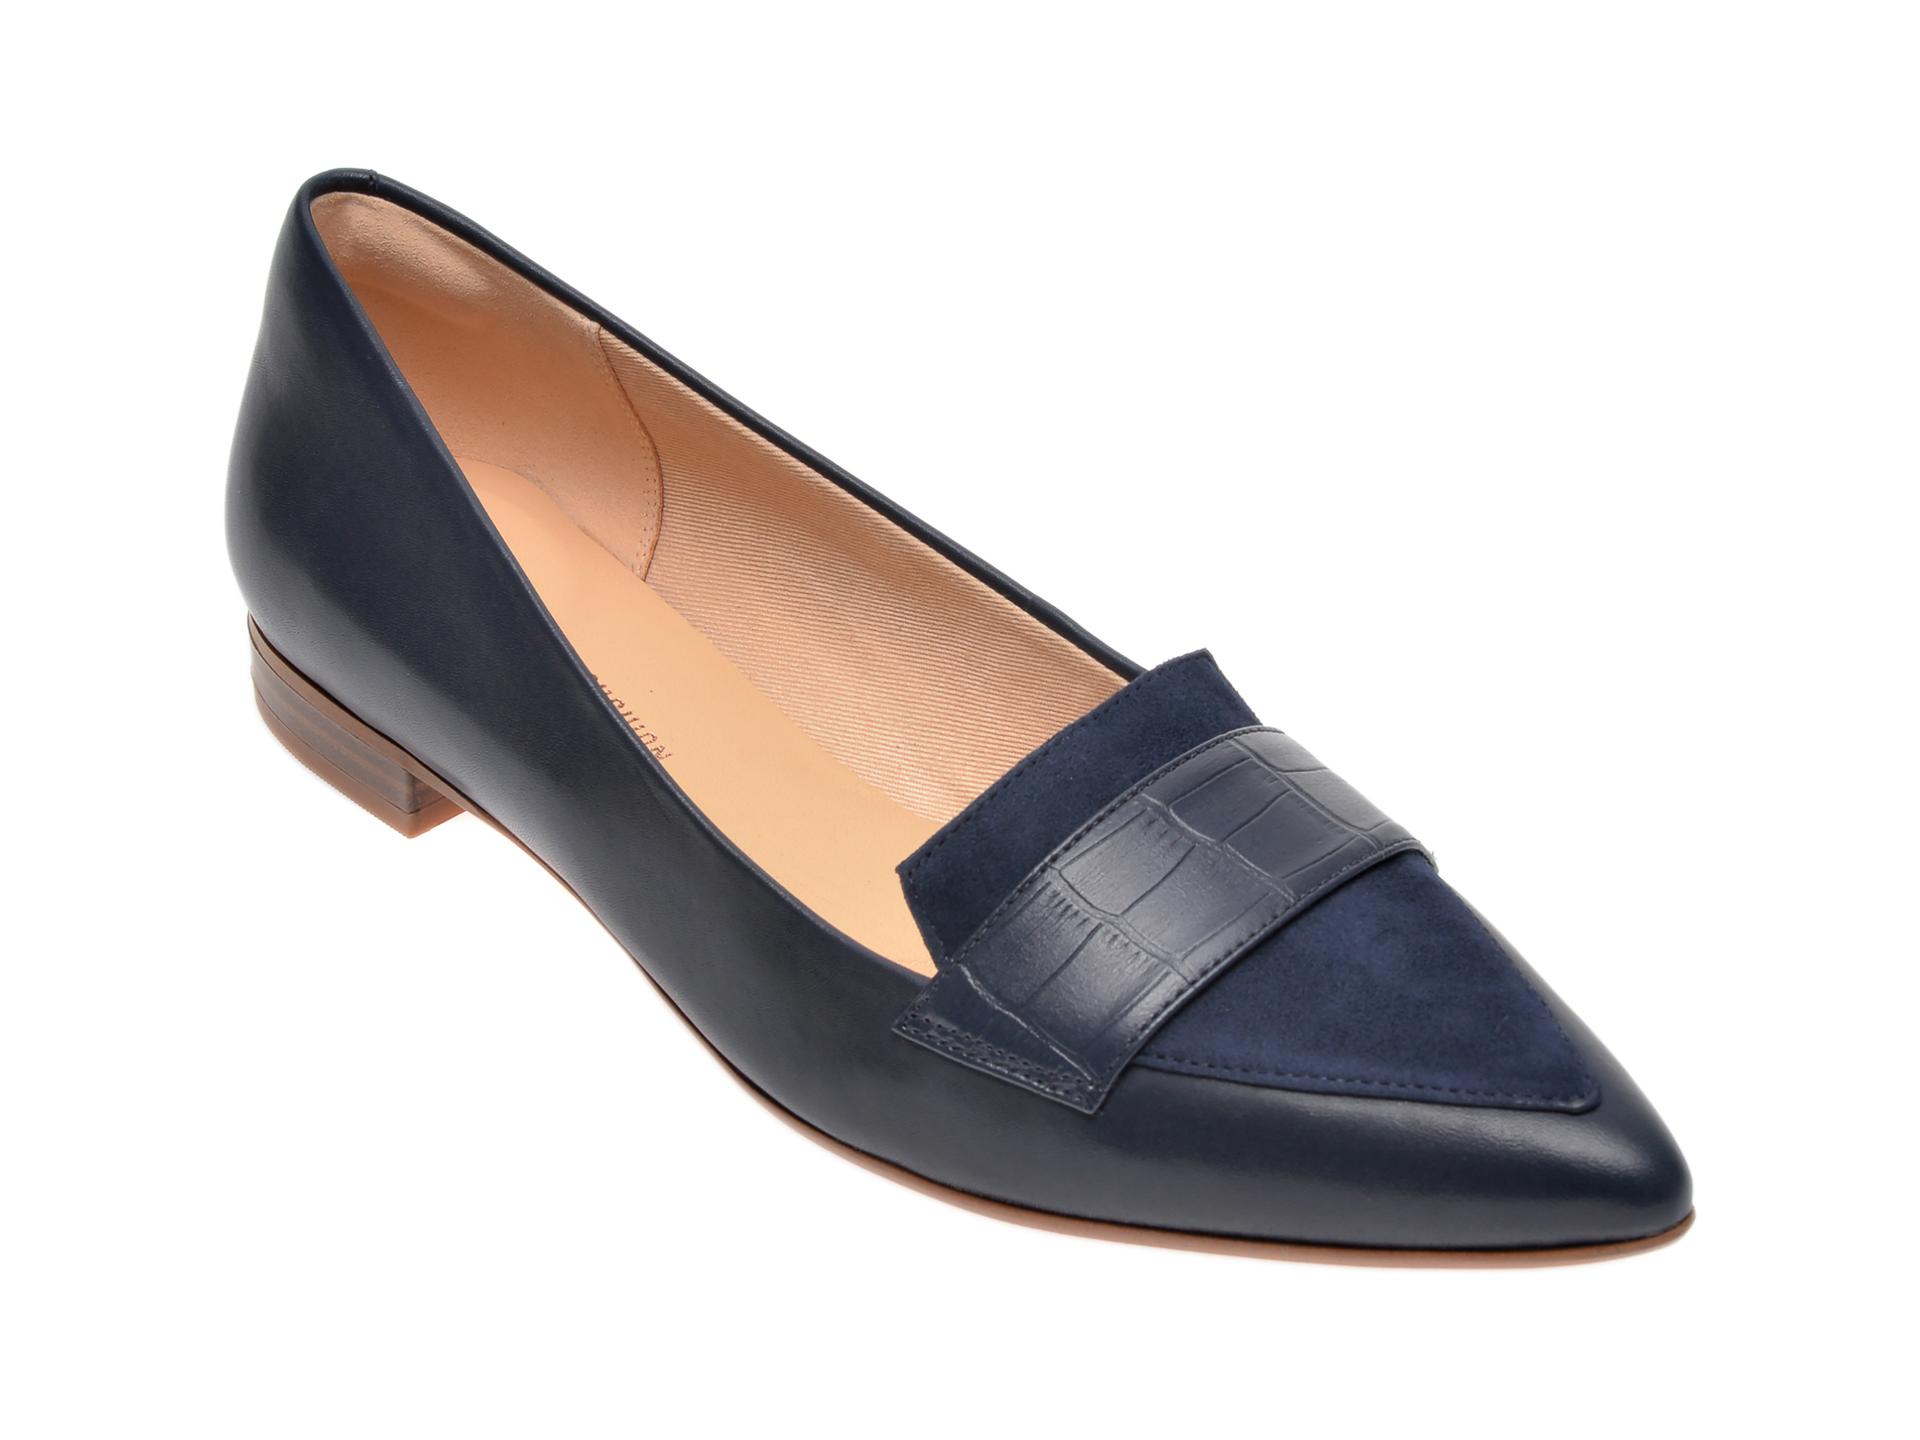 Pantofi CLARKS bleumarin, Laina15 Loafer, din piele naturala imagine